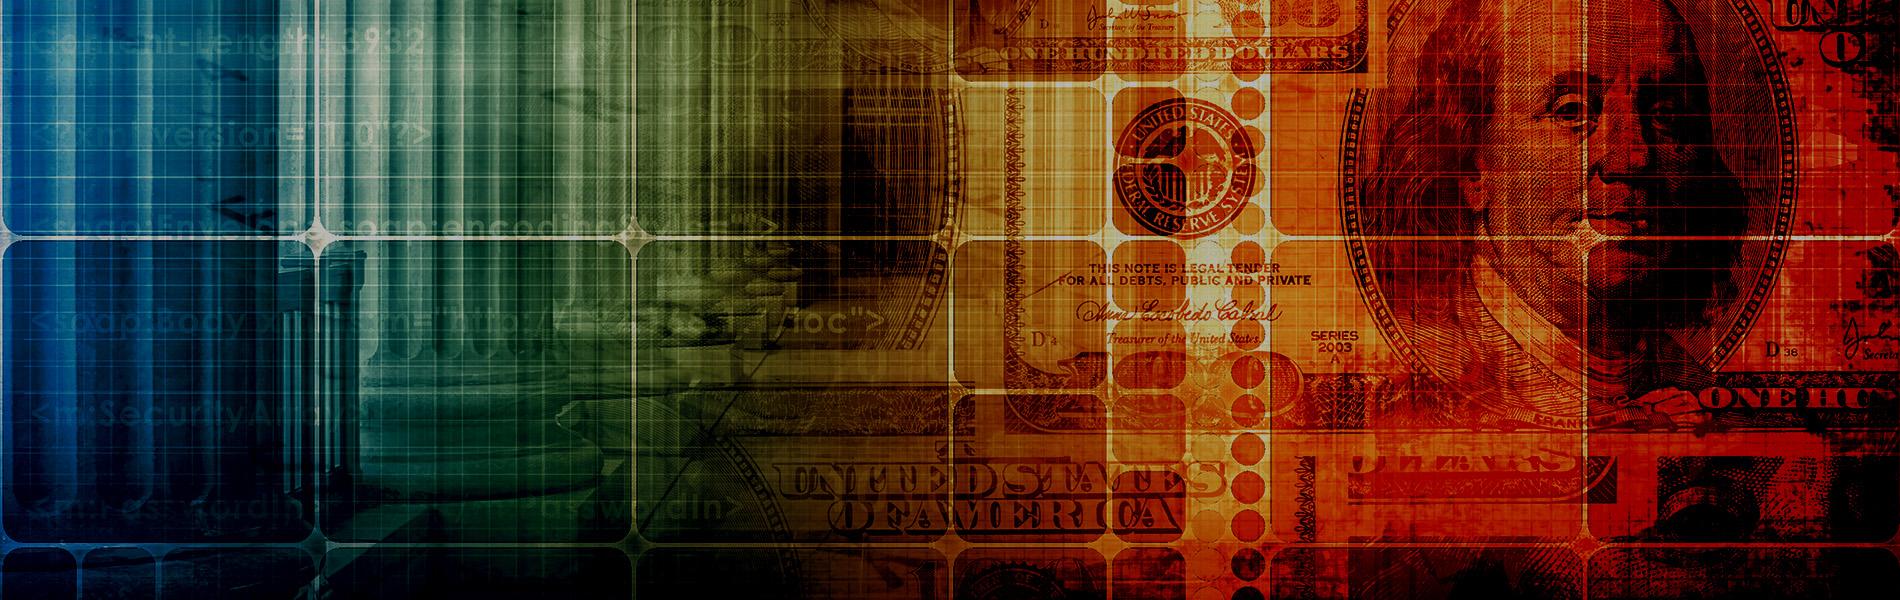 My Finance Resource in Thousand Oaks Rotator 1